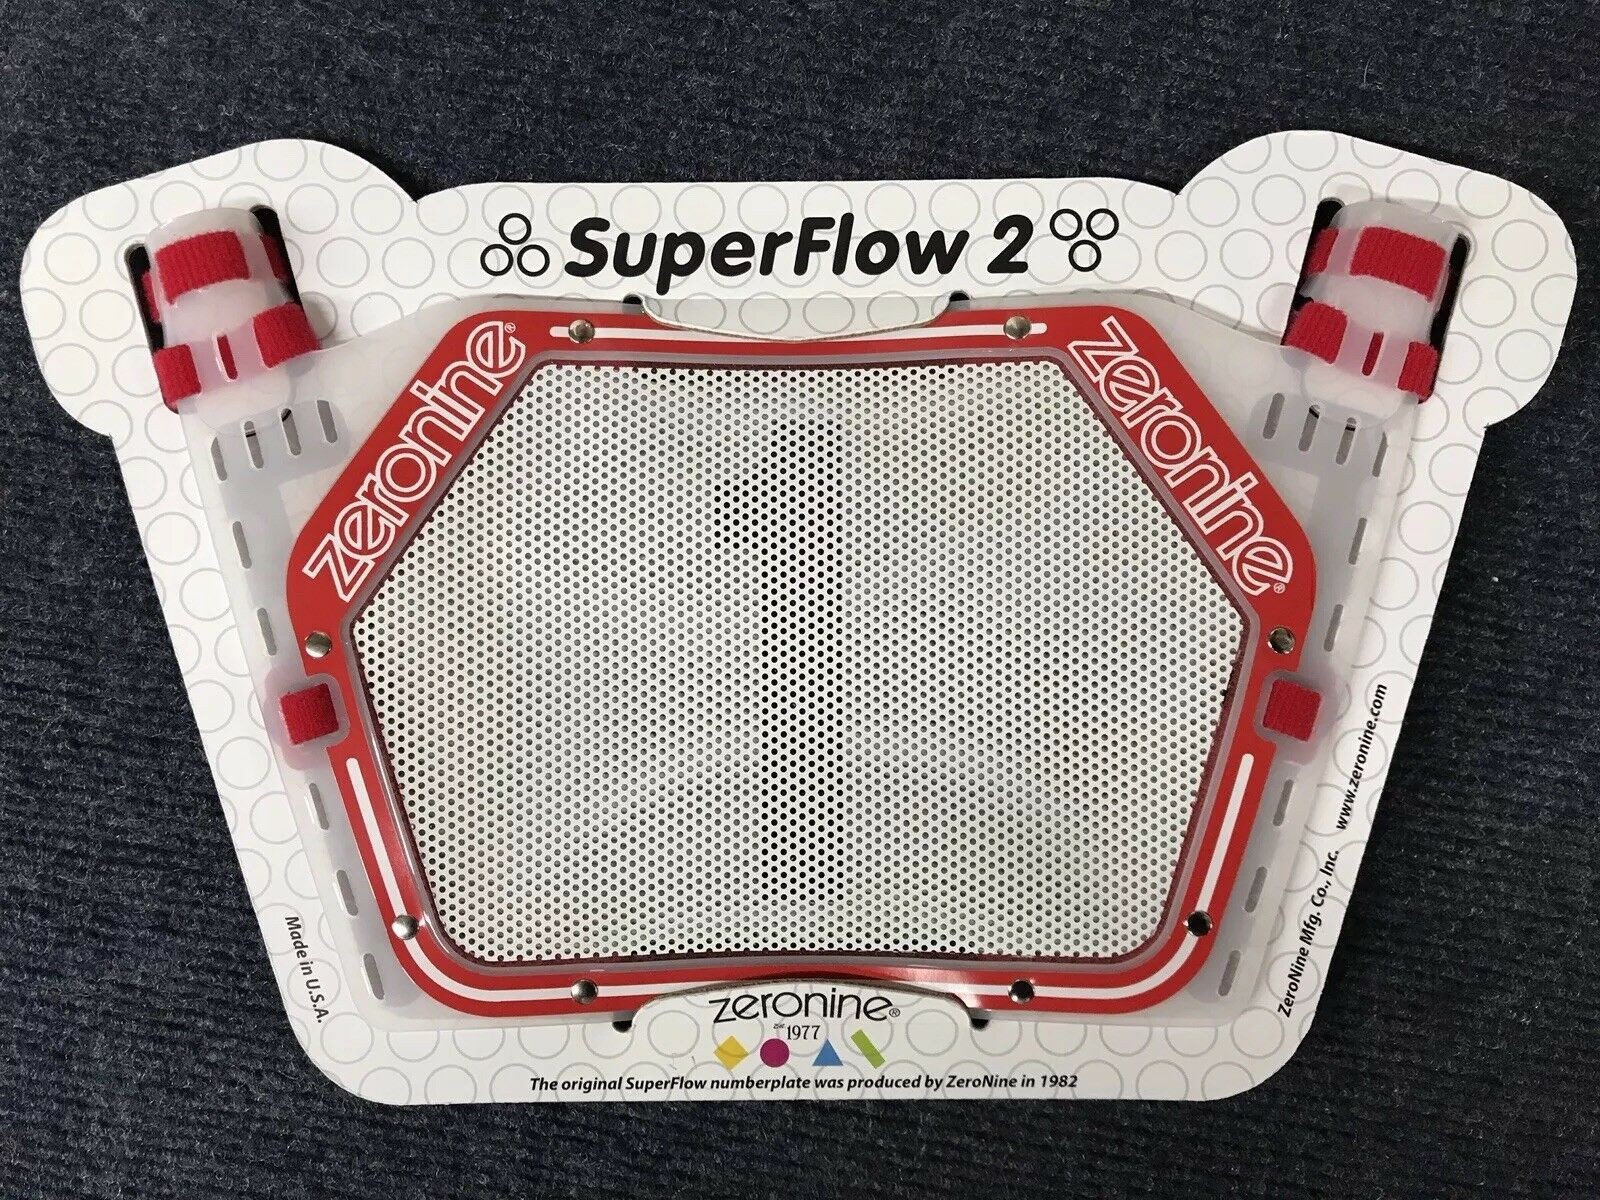 ZeroNine 2019 SuperFlow2 numberplateRed & White full set of Superflow numbers